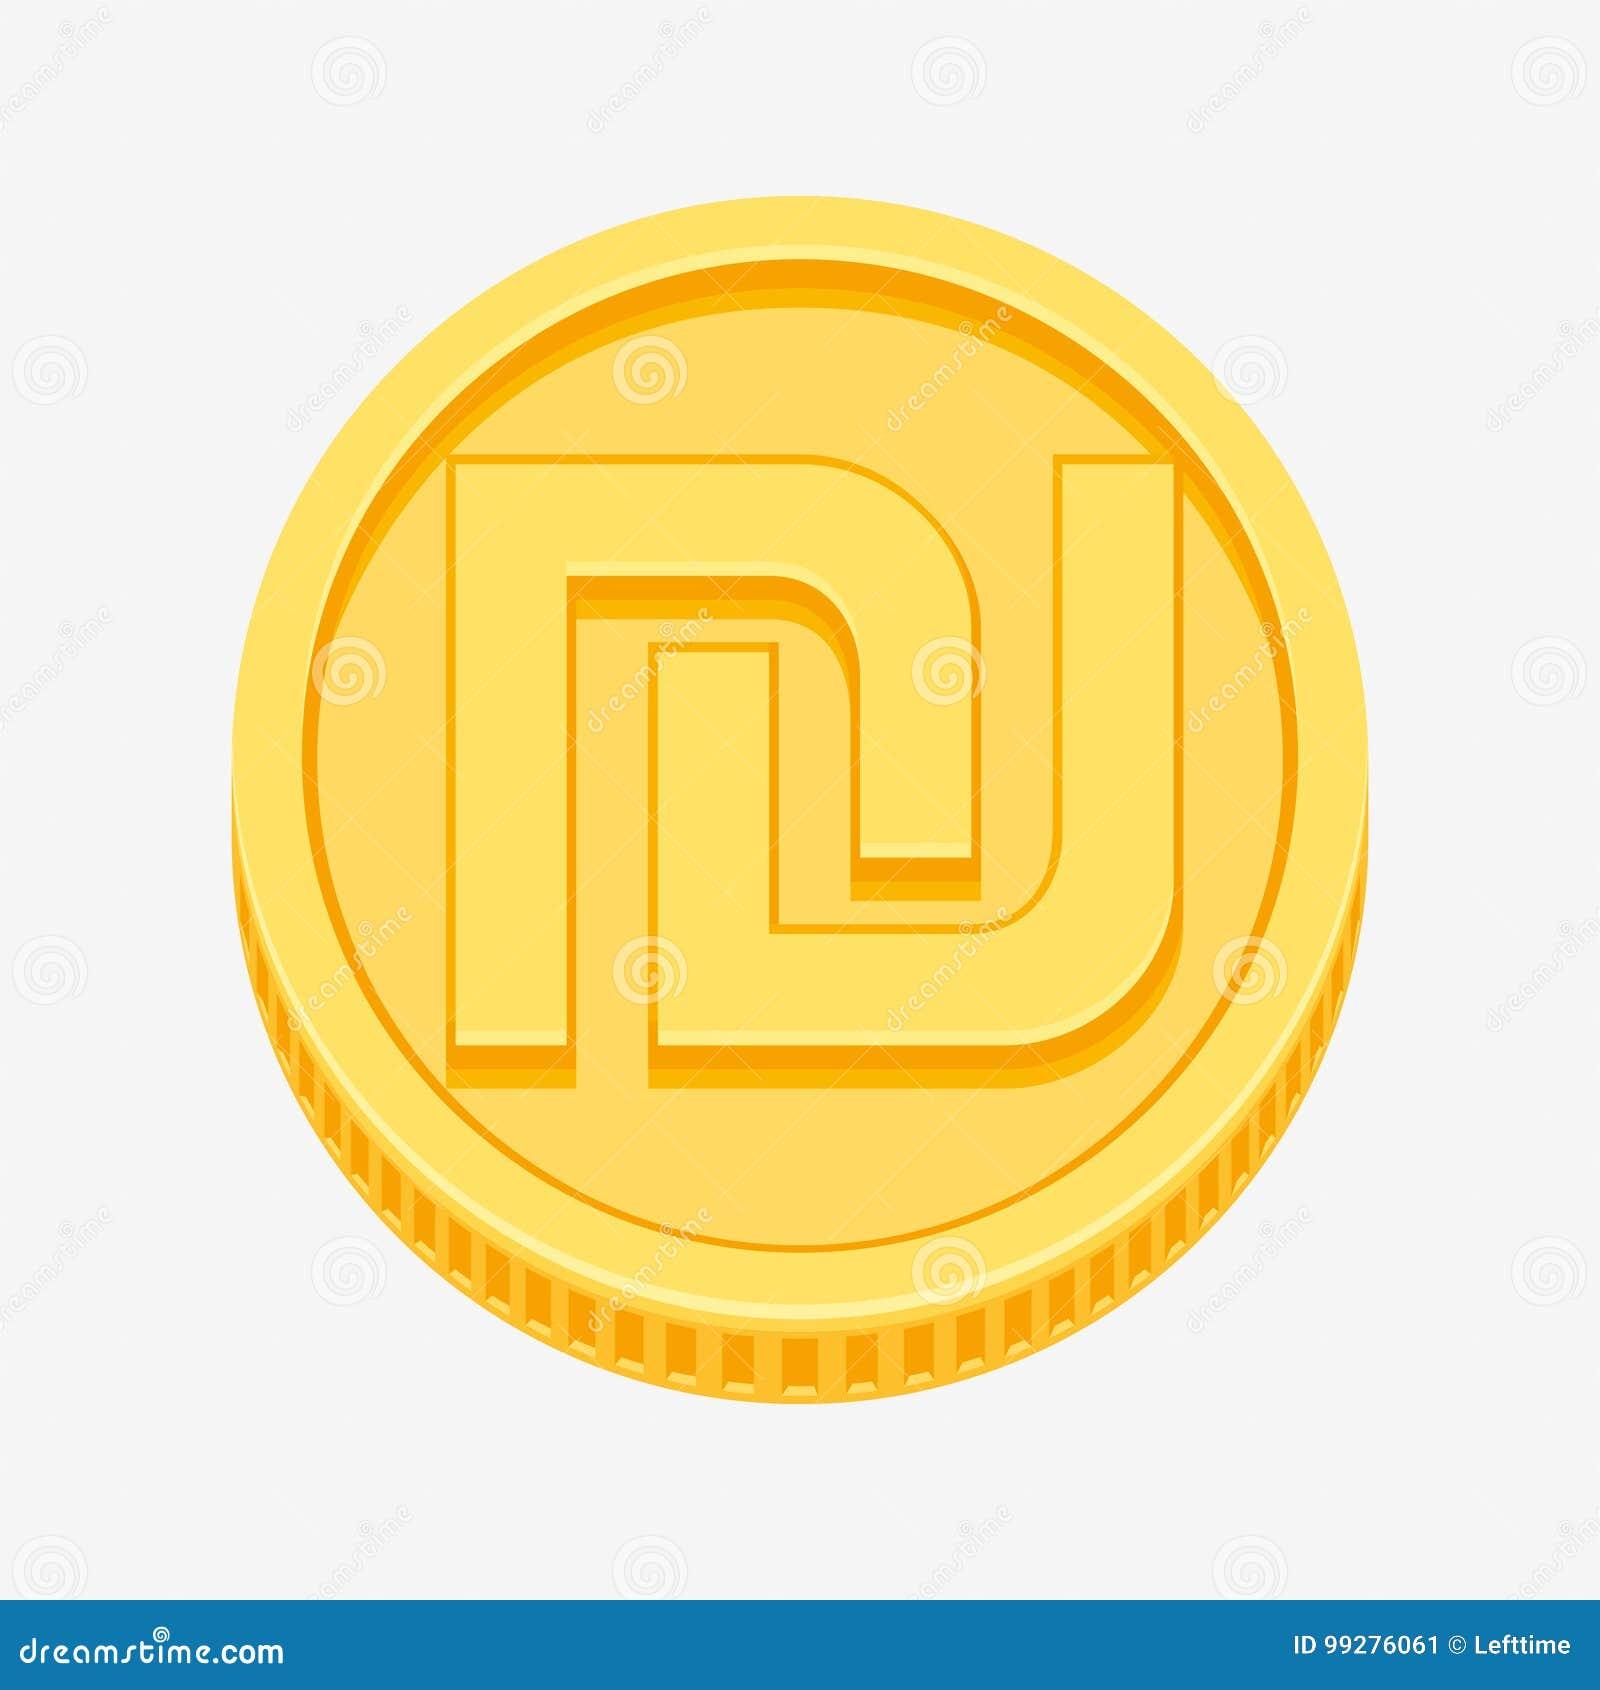 Israeli Shekel Symbol On Gold Coin Stock Vector Illustration Of